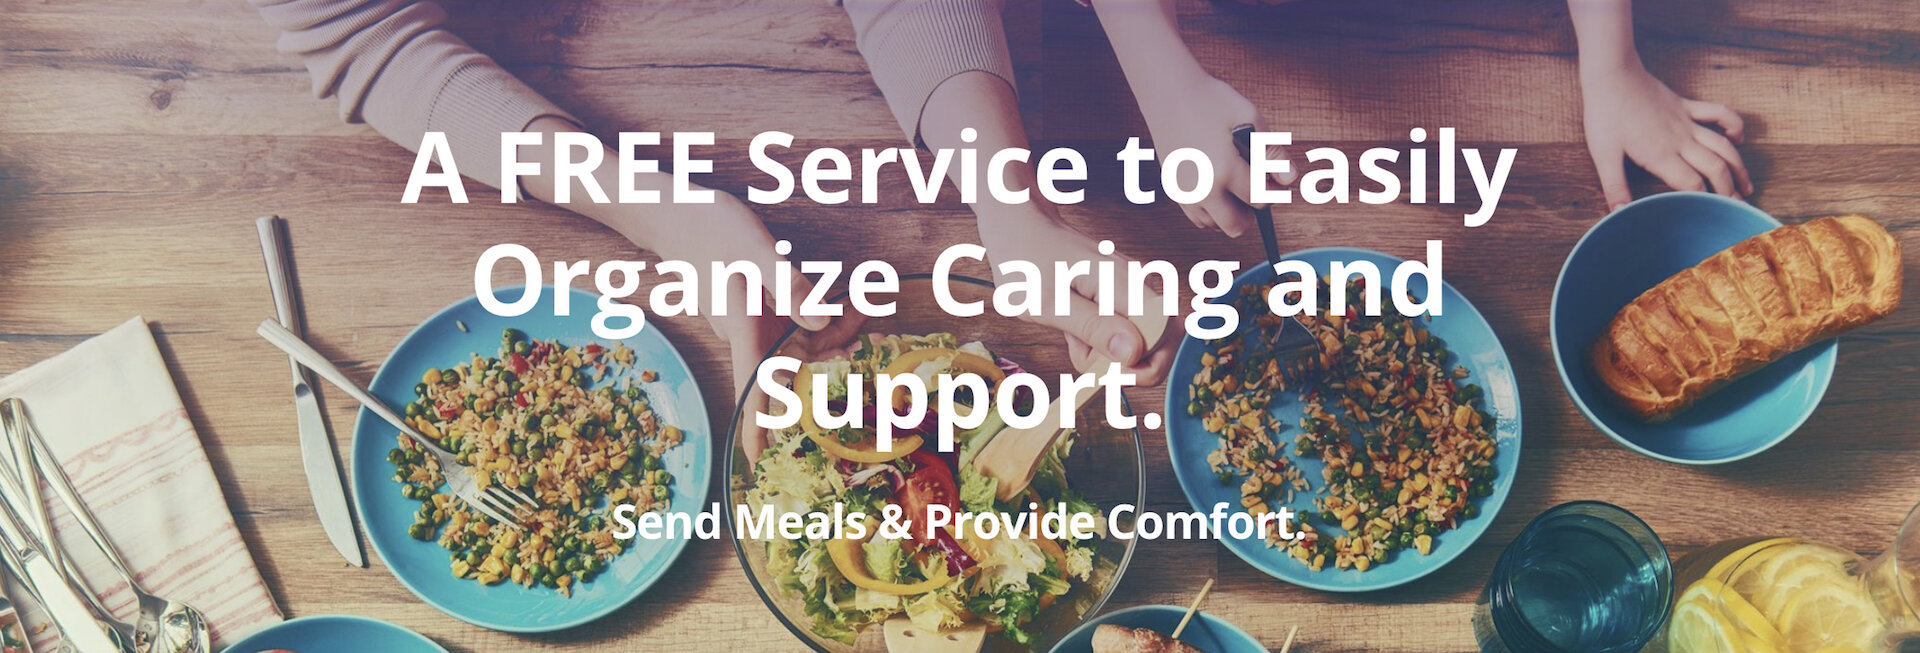 Caring Organizer website banner.jpg